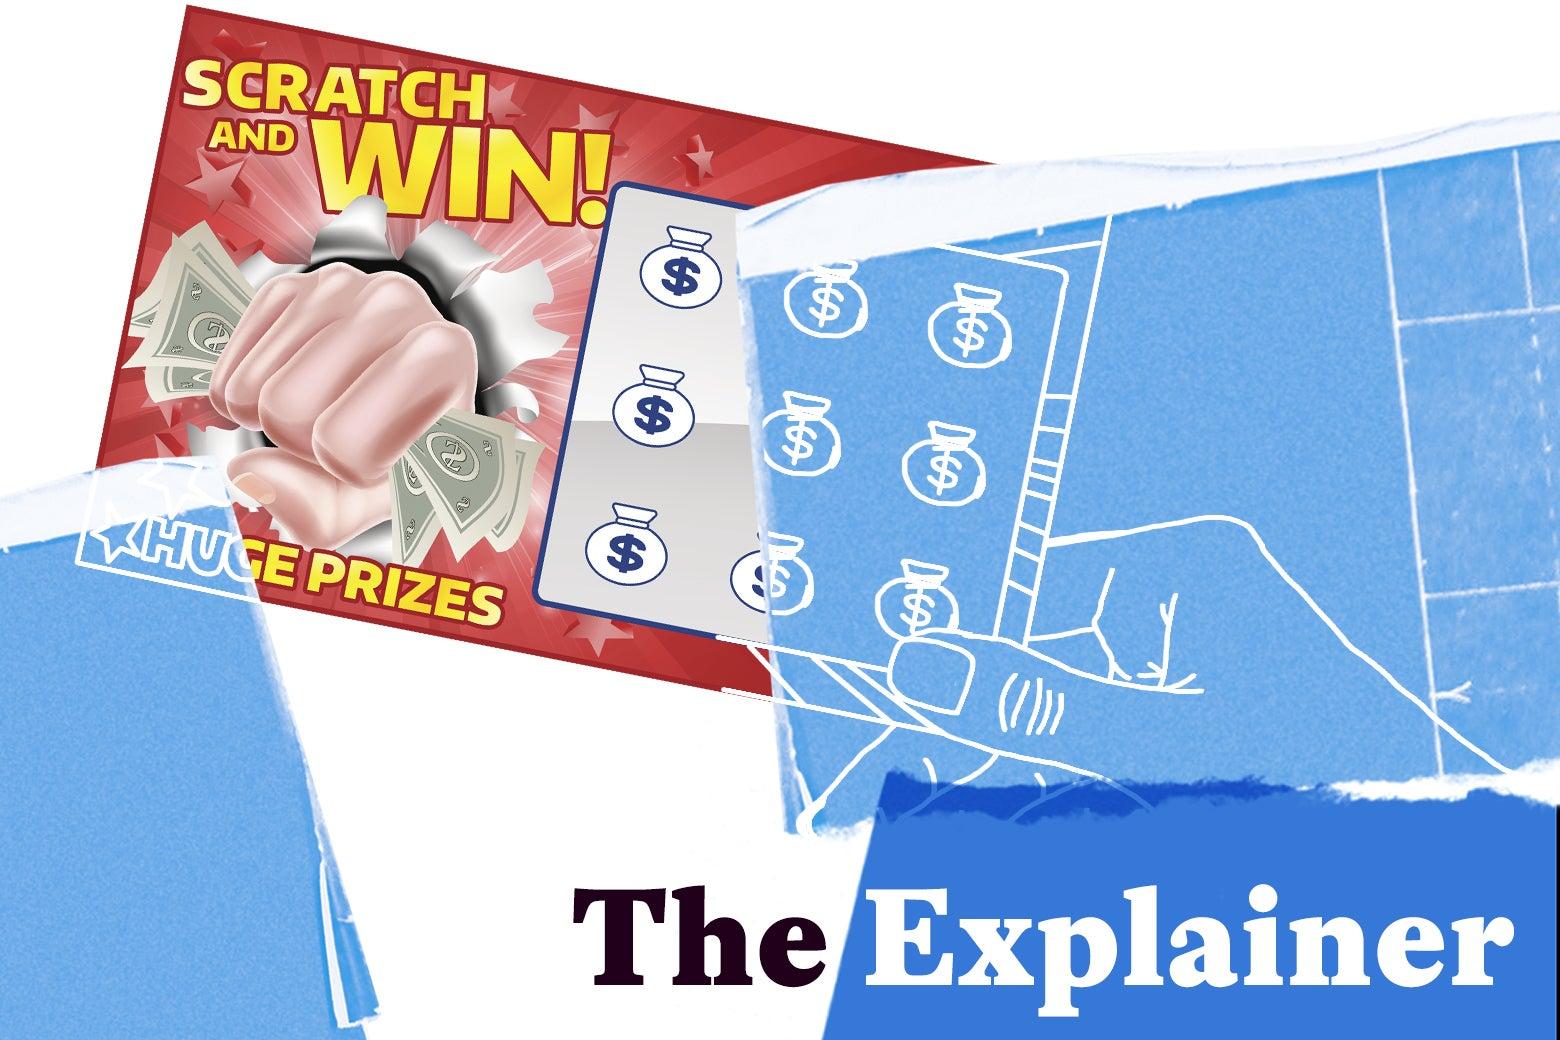 Scratch-off lottery ticket being taken